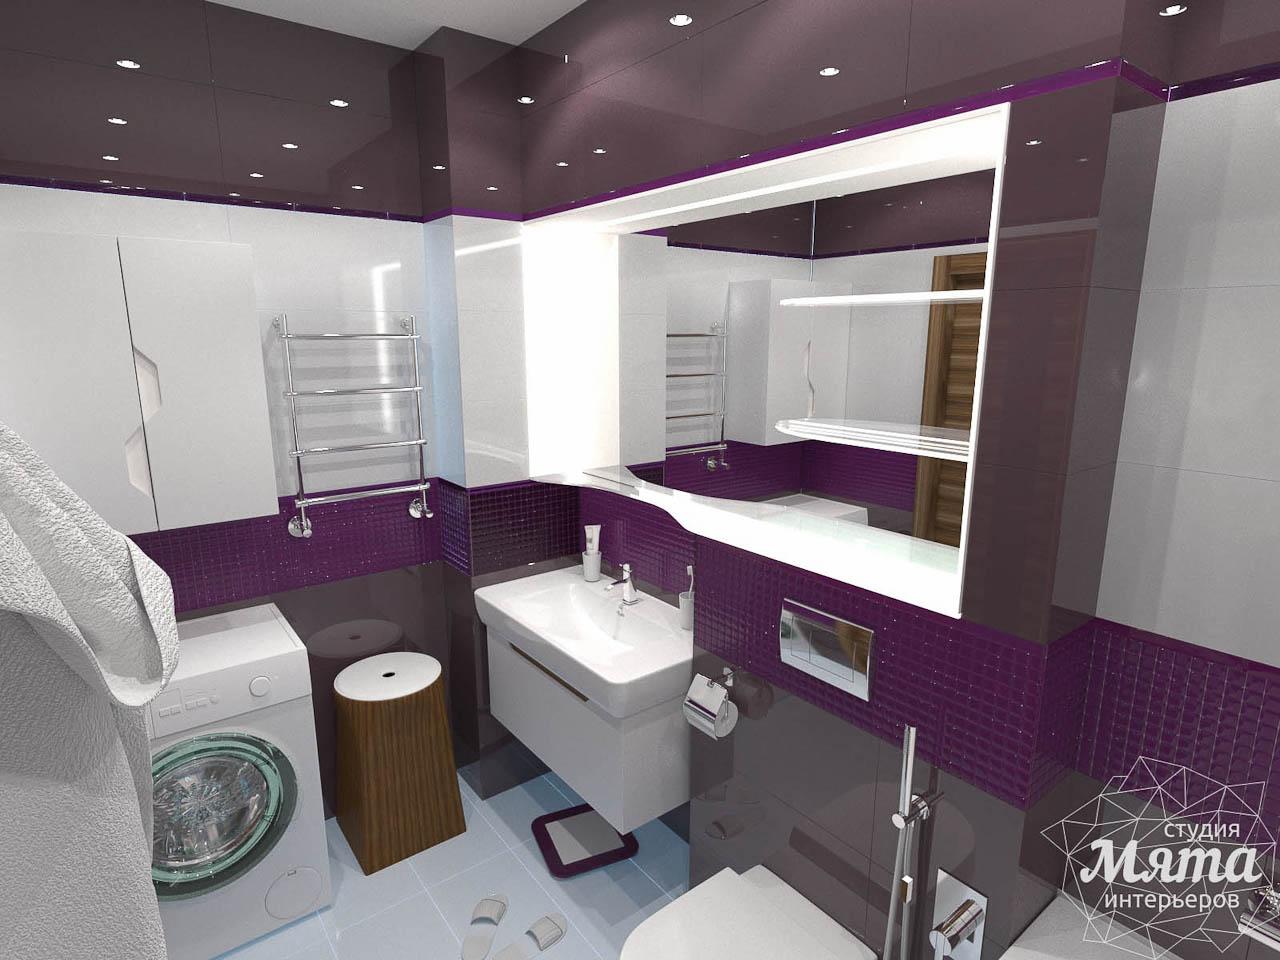 Дизайн интерьера трехкомнатной квартиры по ул. Мельникова 27 img1469244061